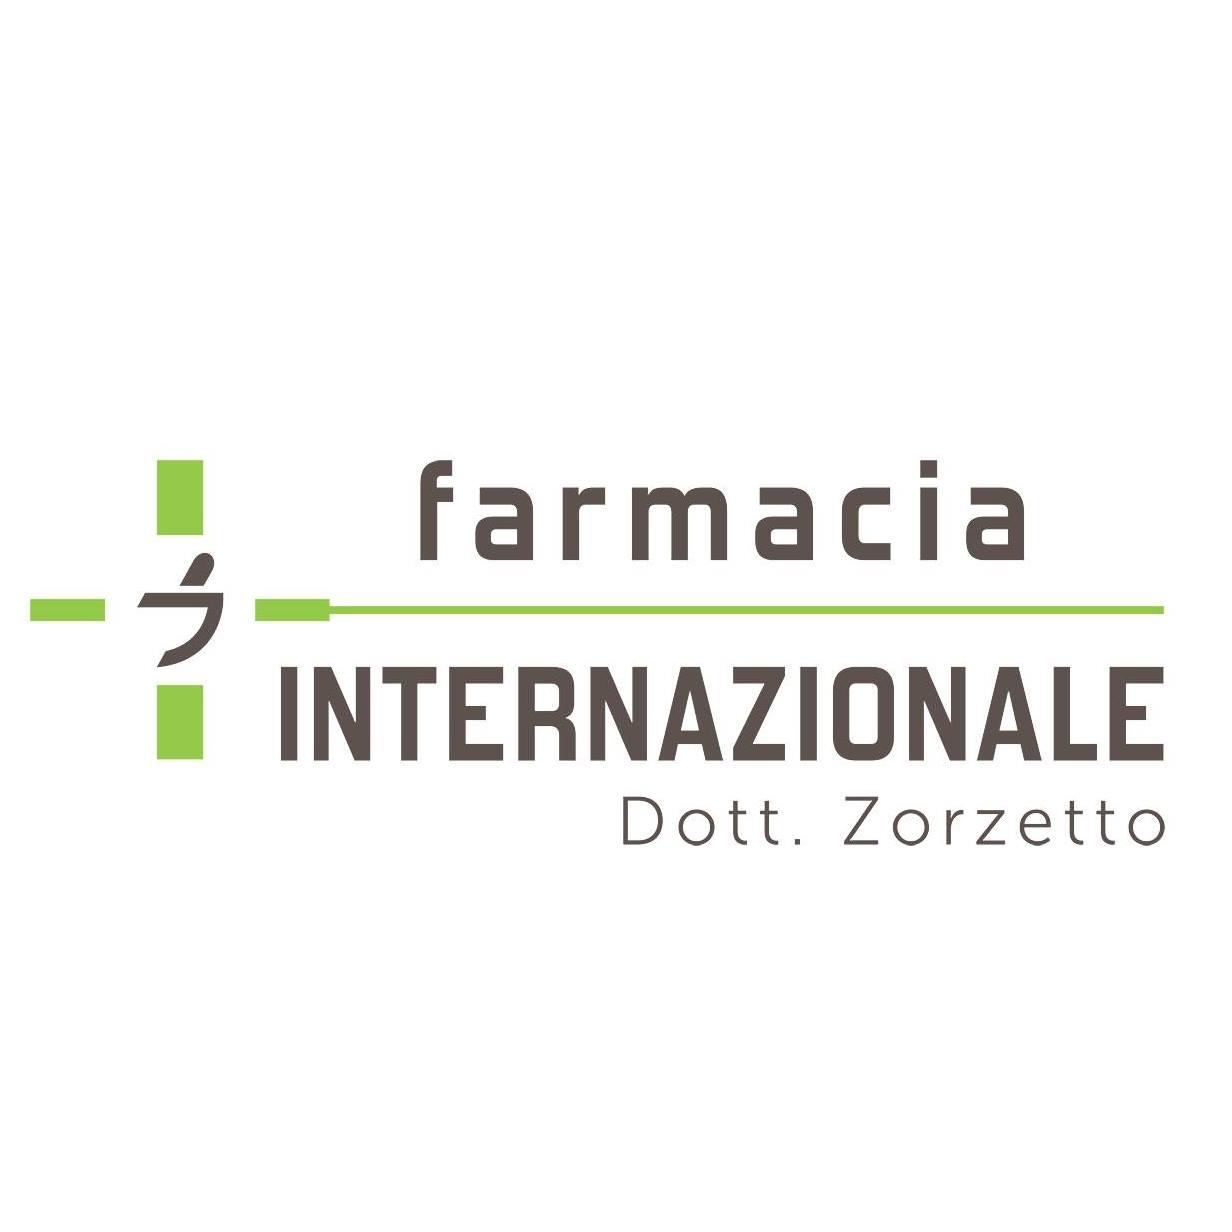 Farmacia Internazionale Dott. Zorzetto